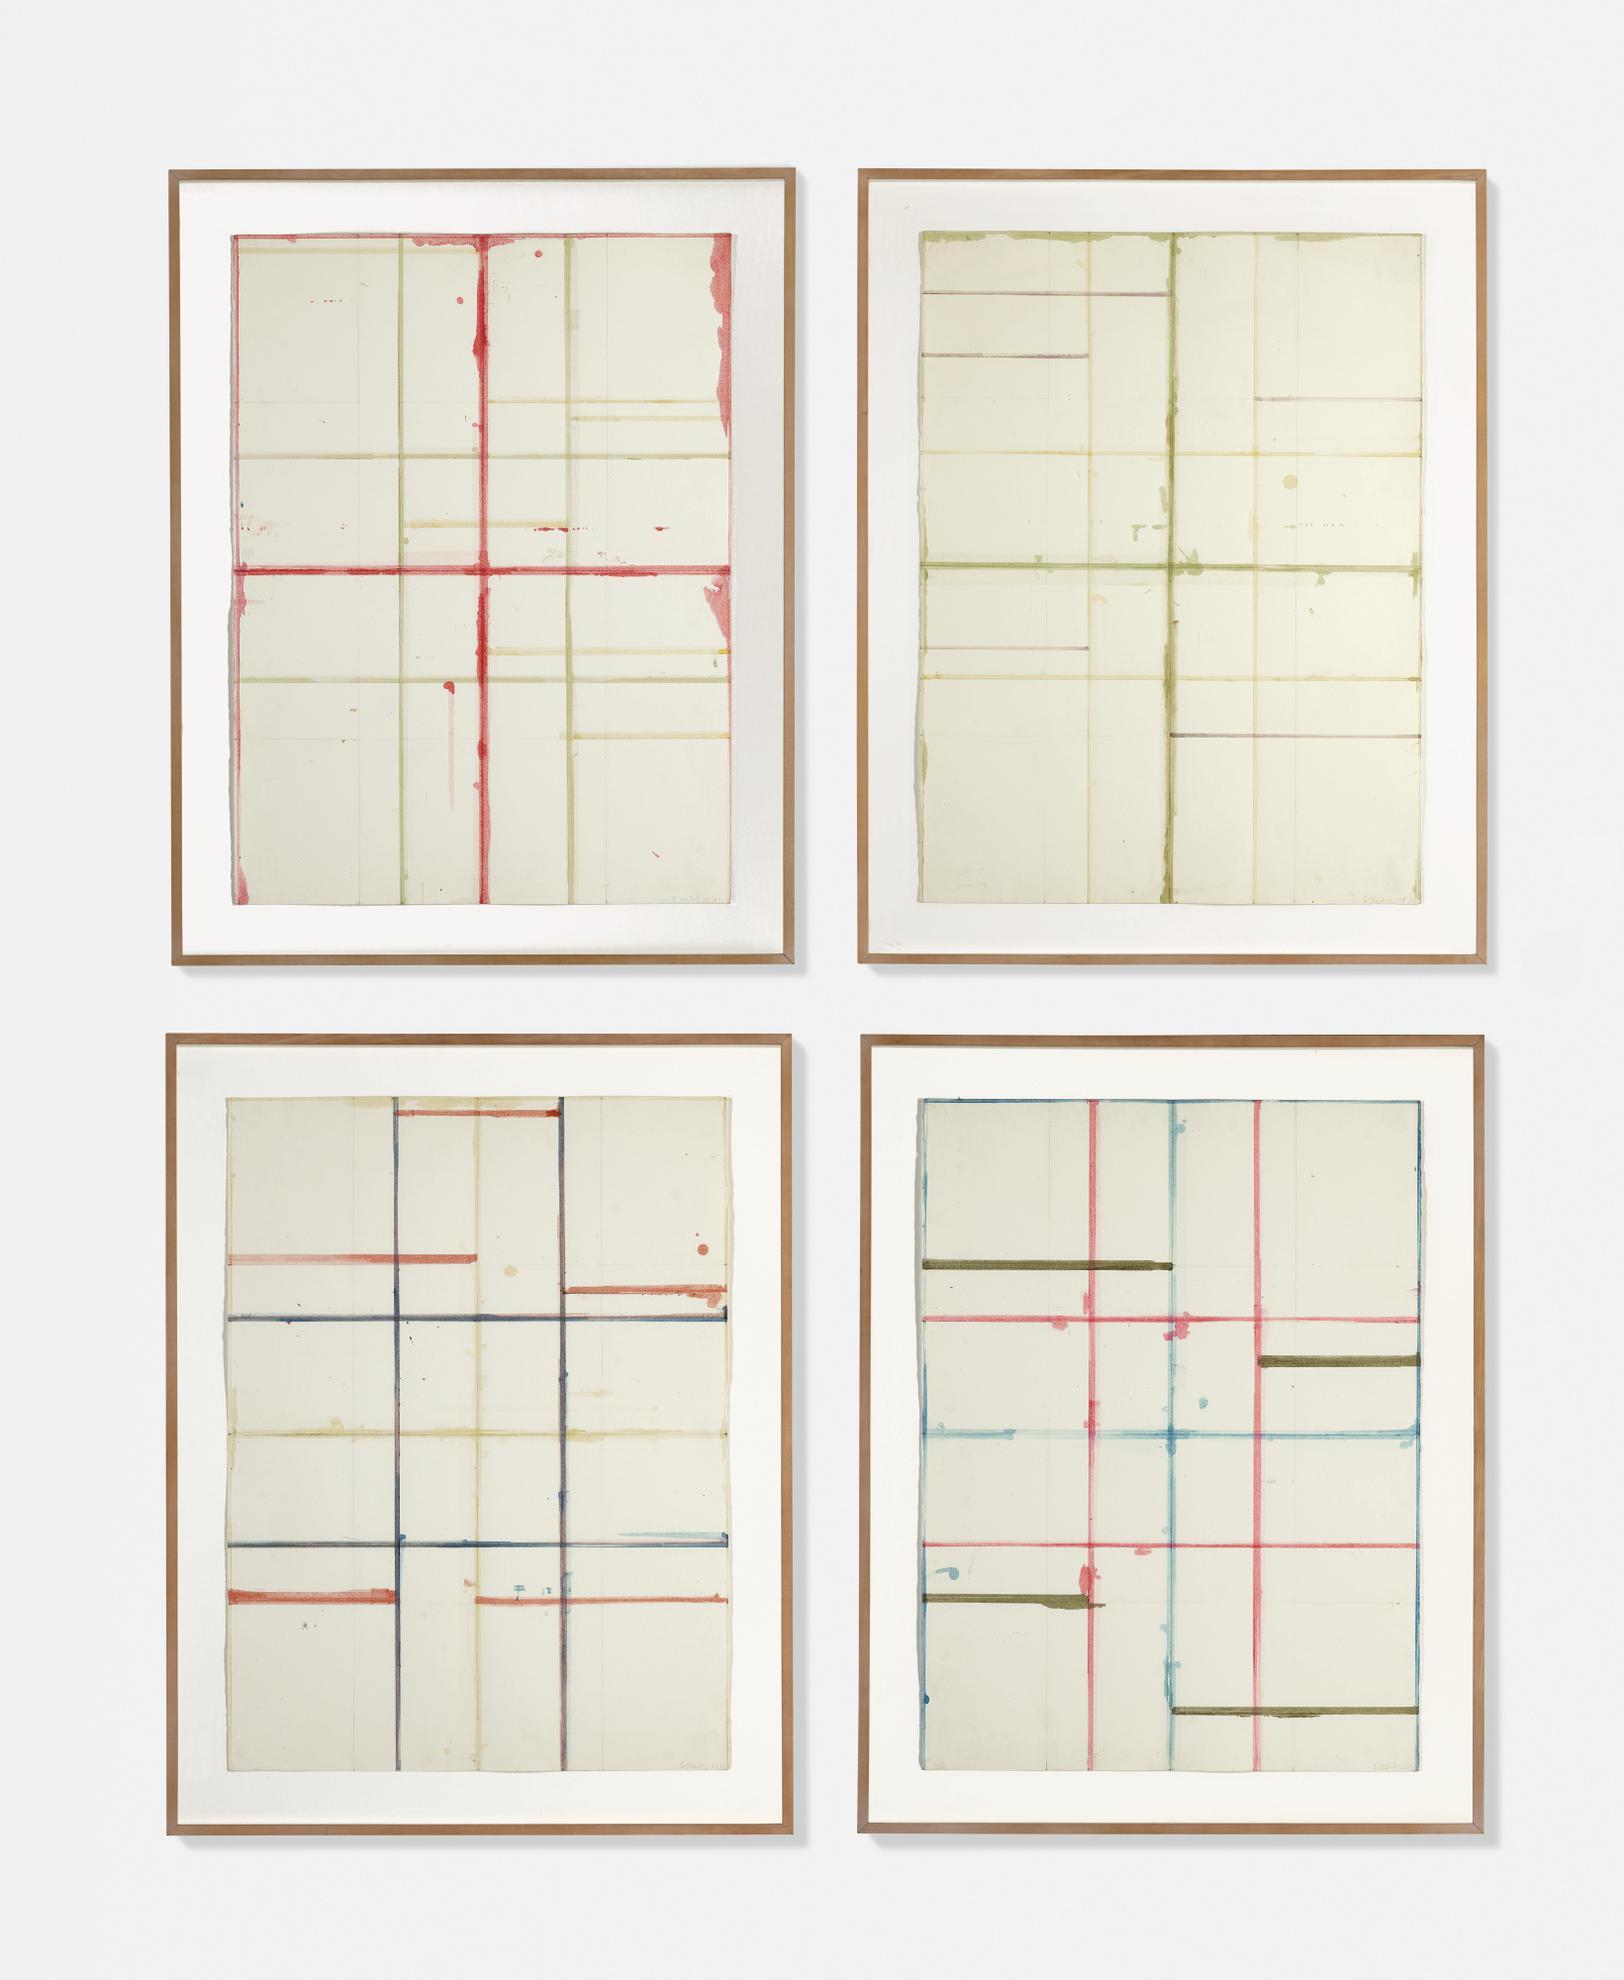 Brice Marden-Basel Drawings (Window Studies No. 1, 2, 4, 5)-1983